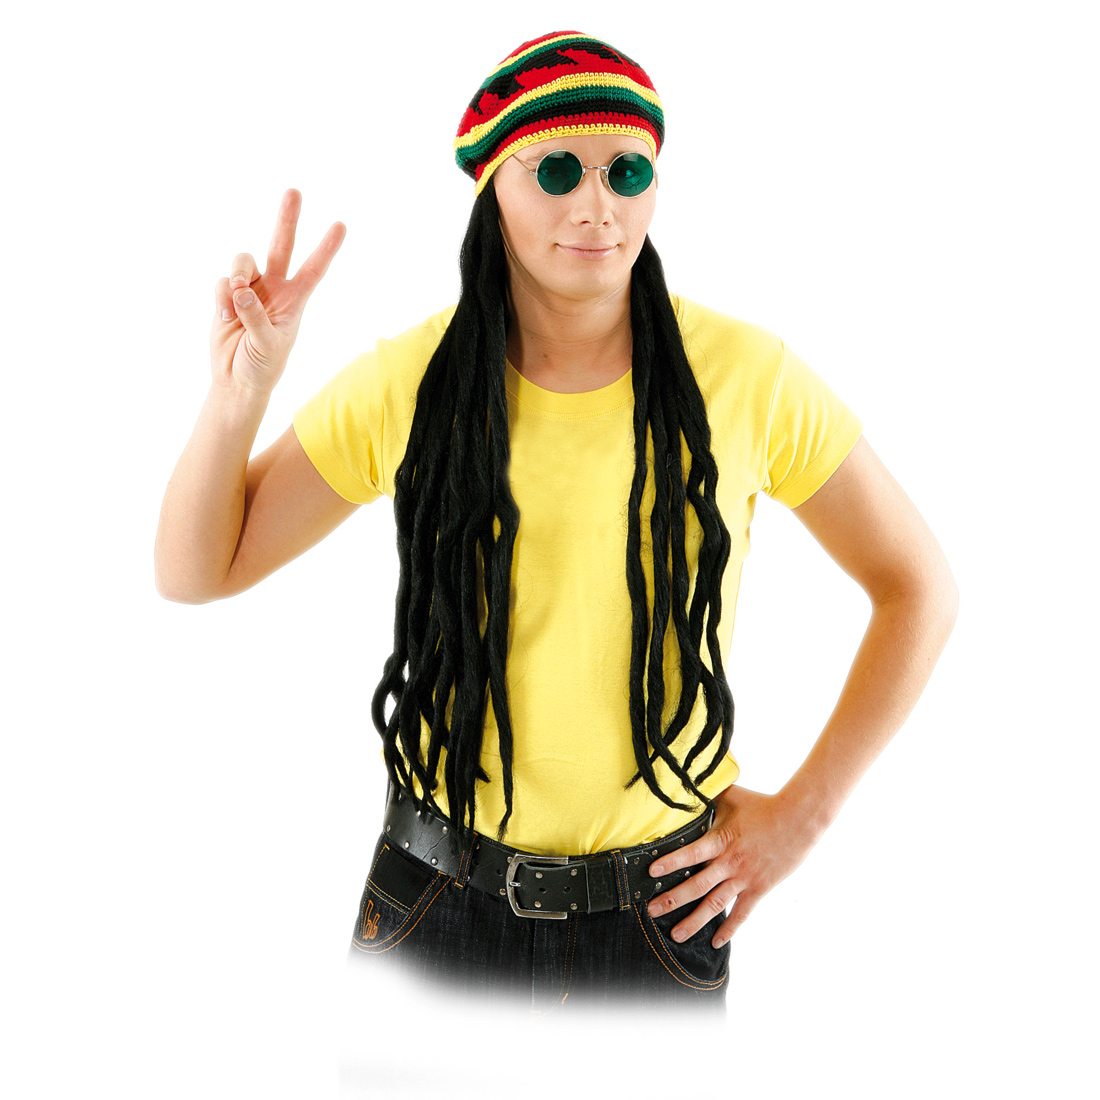 reggae m tze mit rasta z pfen faschingskost m rasta look rastam tze bob marley ebay. Black Bedroom Furniture Sets. Home Design Ideas